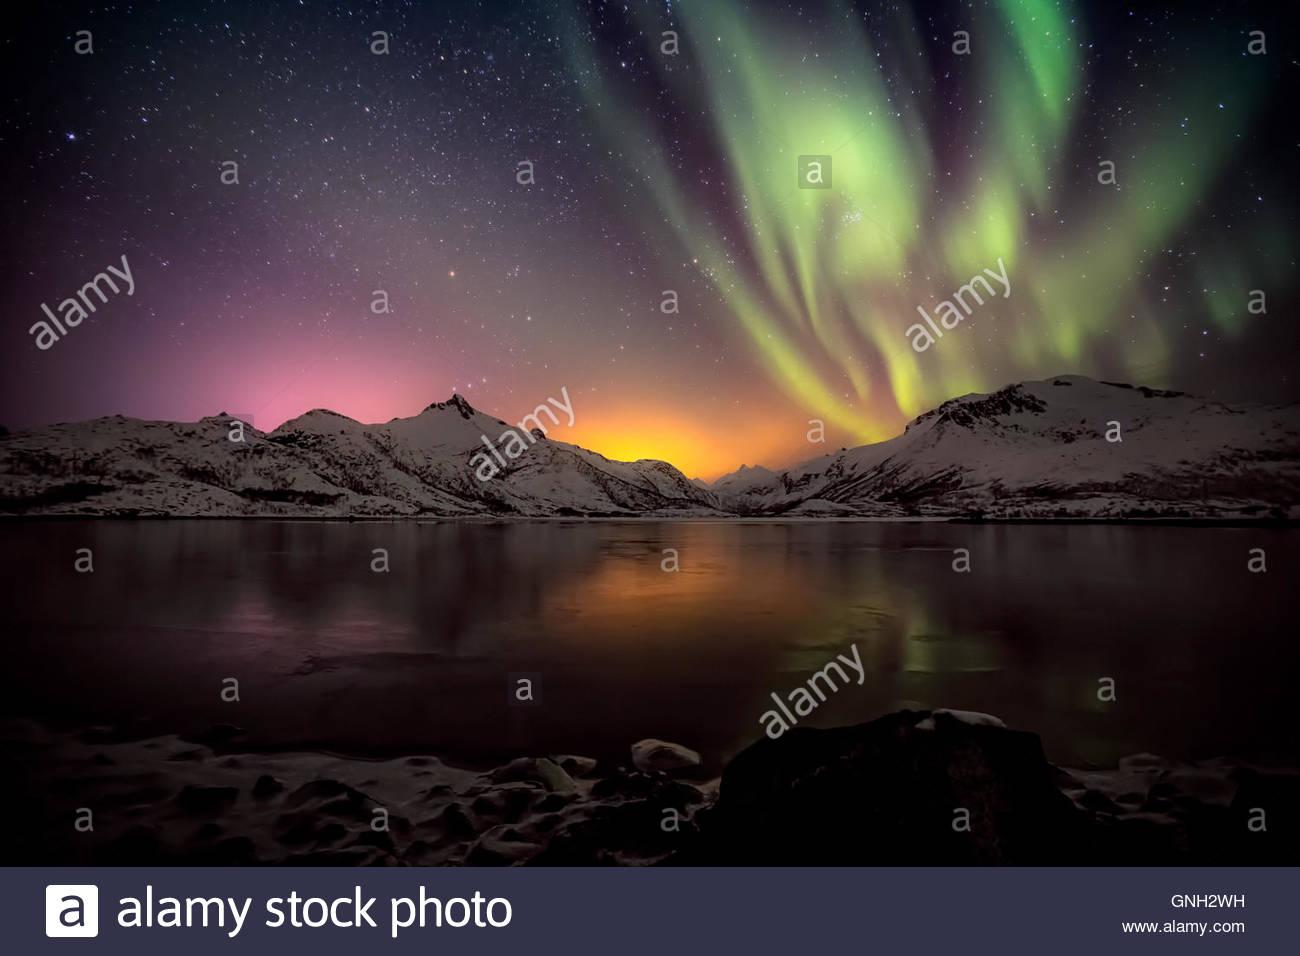 Aurora boreale, arcipelago delle Lofoten, Nordland, Norvegia Immagini Stock